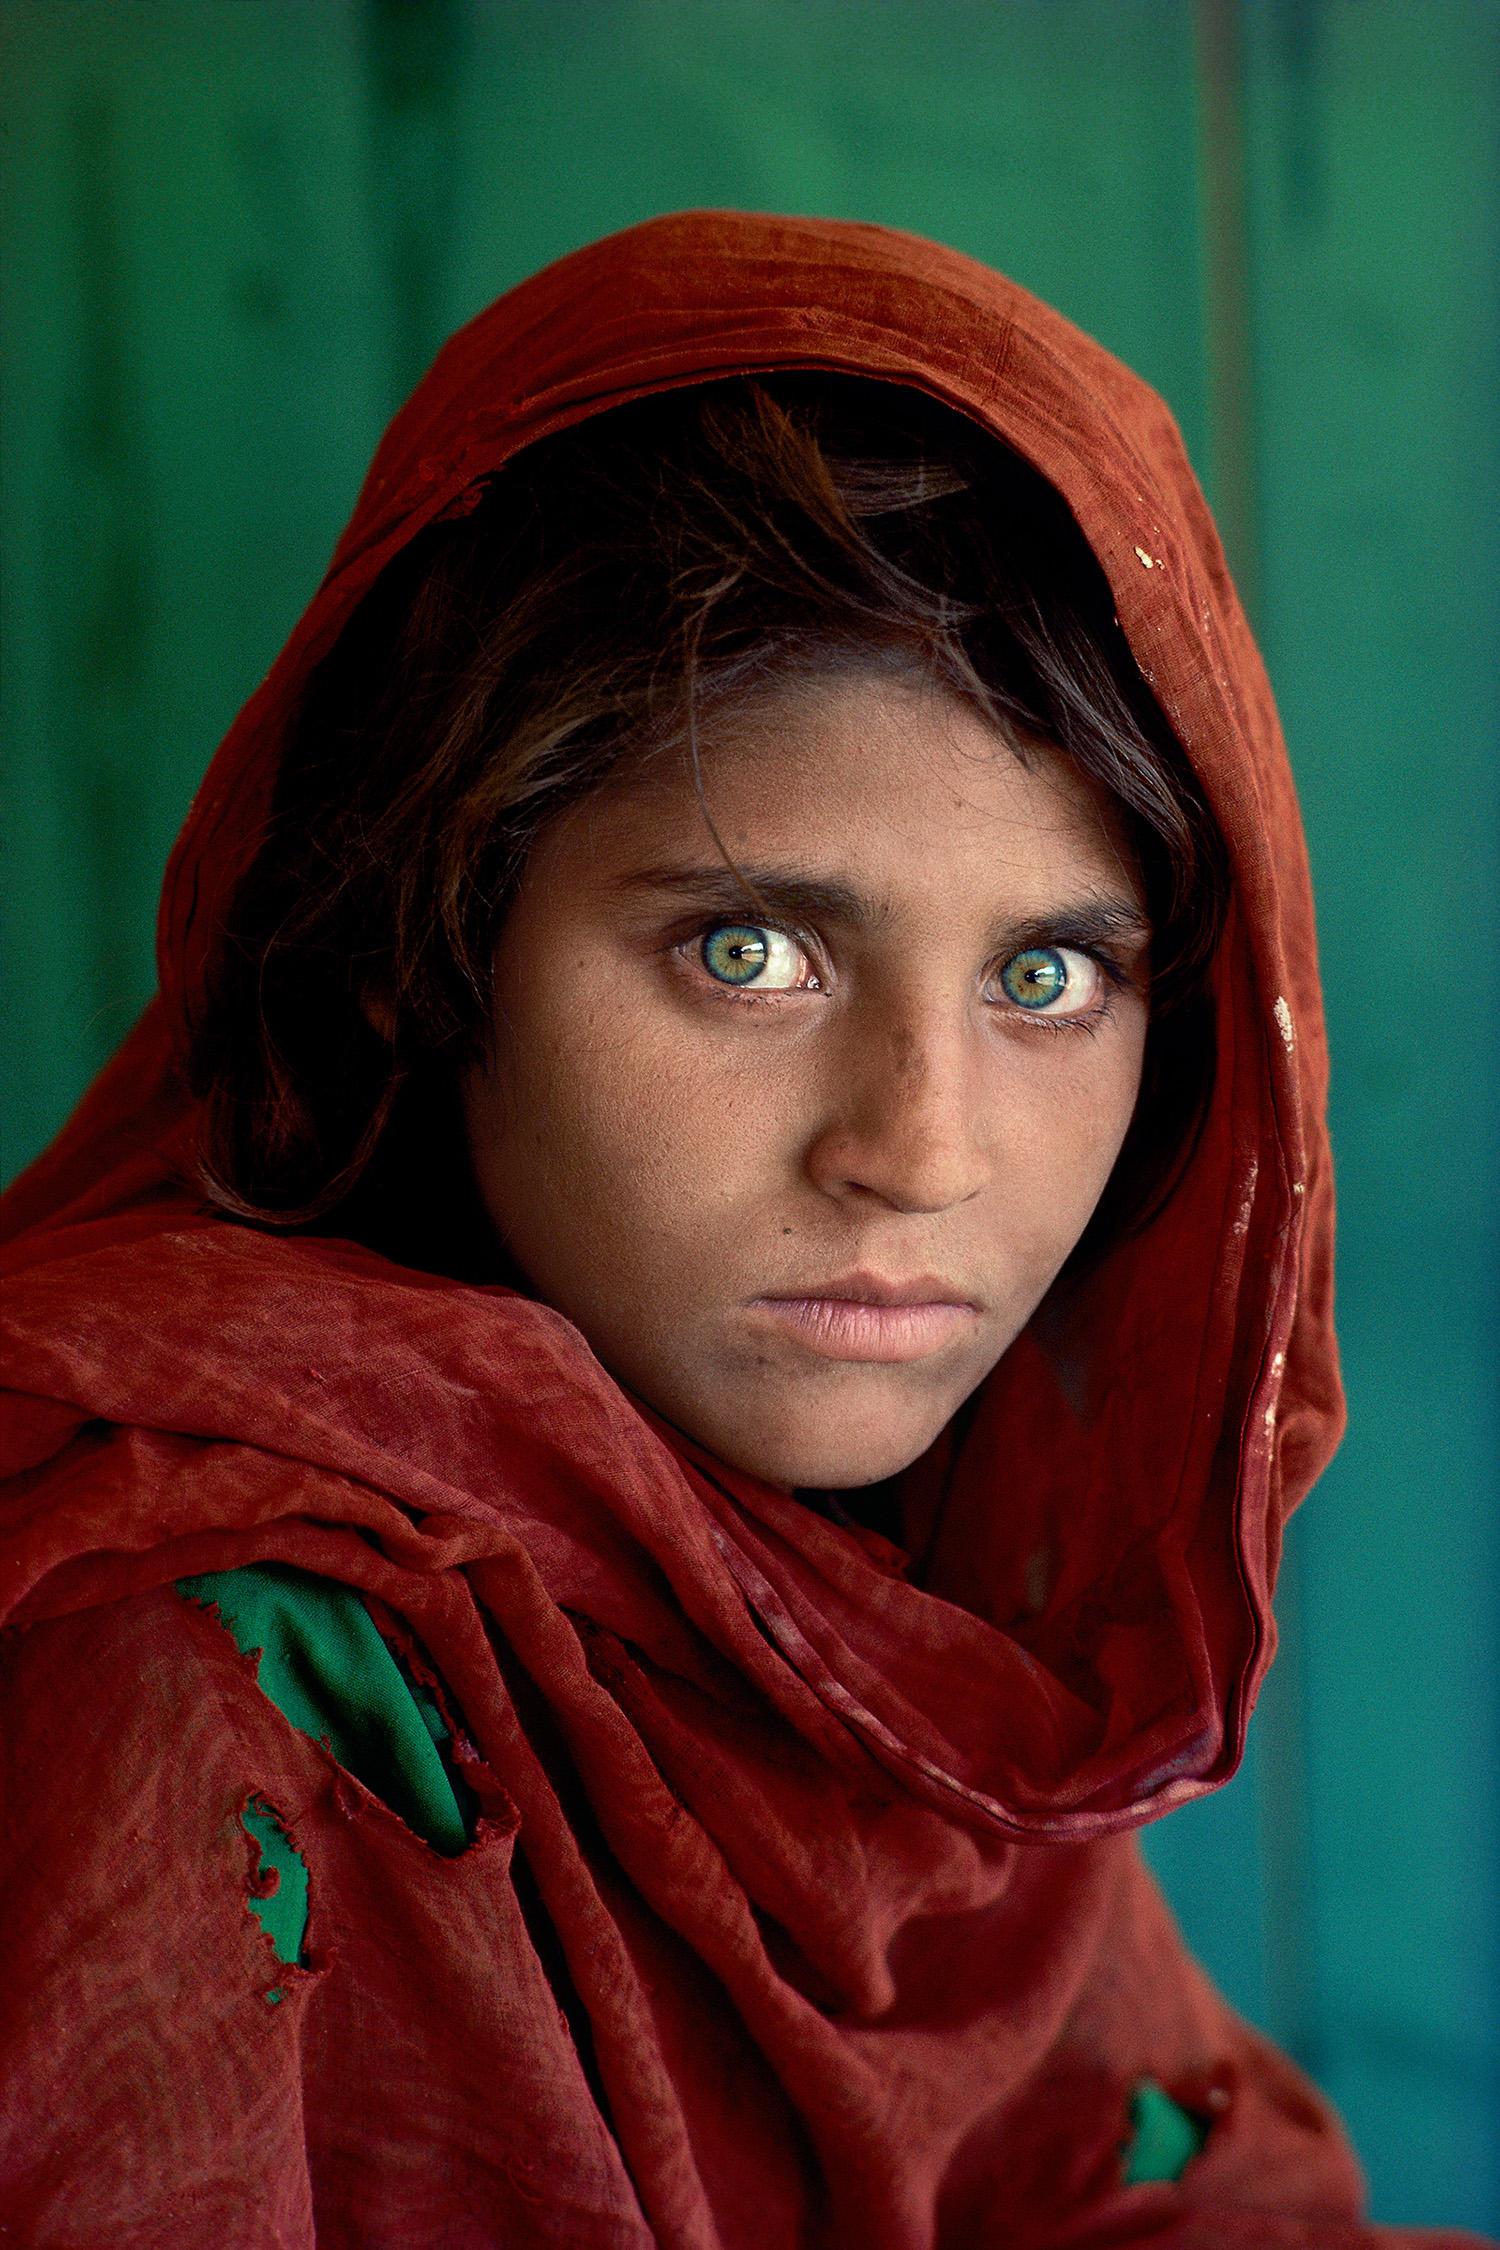 20 ans plus tard Lafghane-aux-yeux-verts-steve-mc-curry